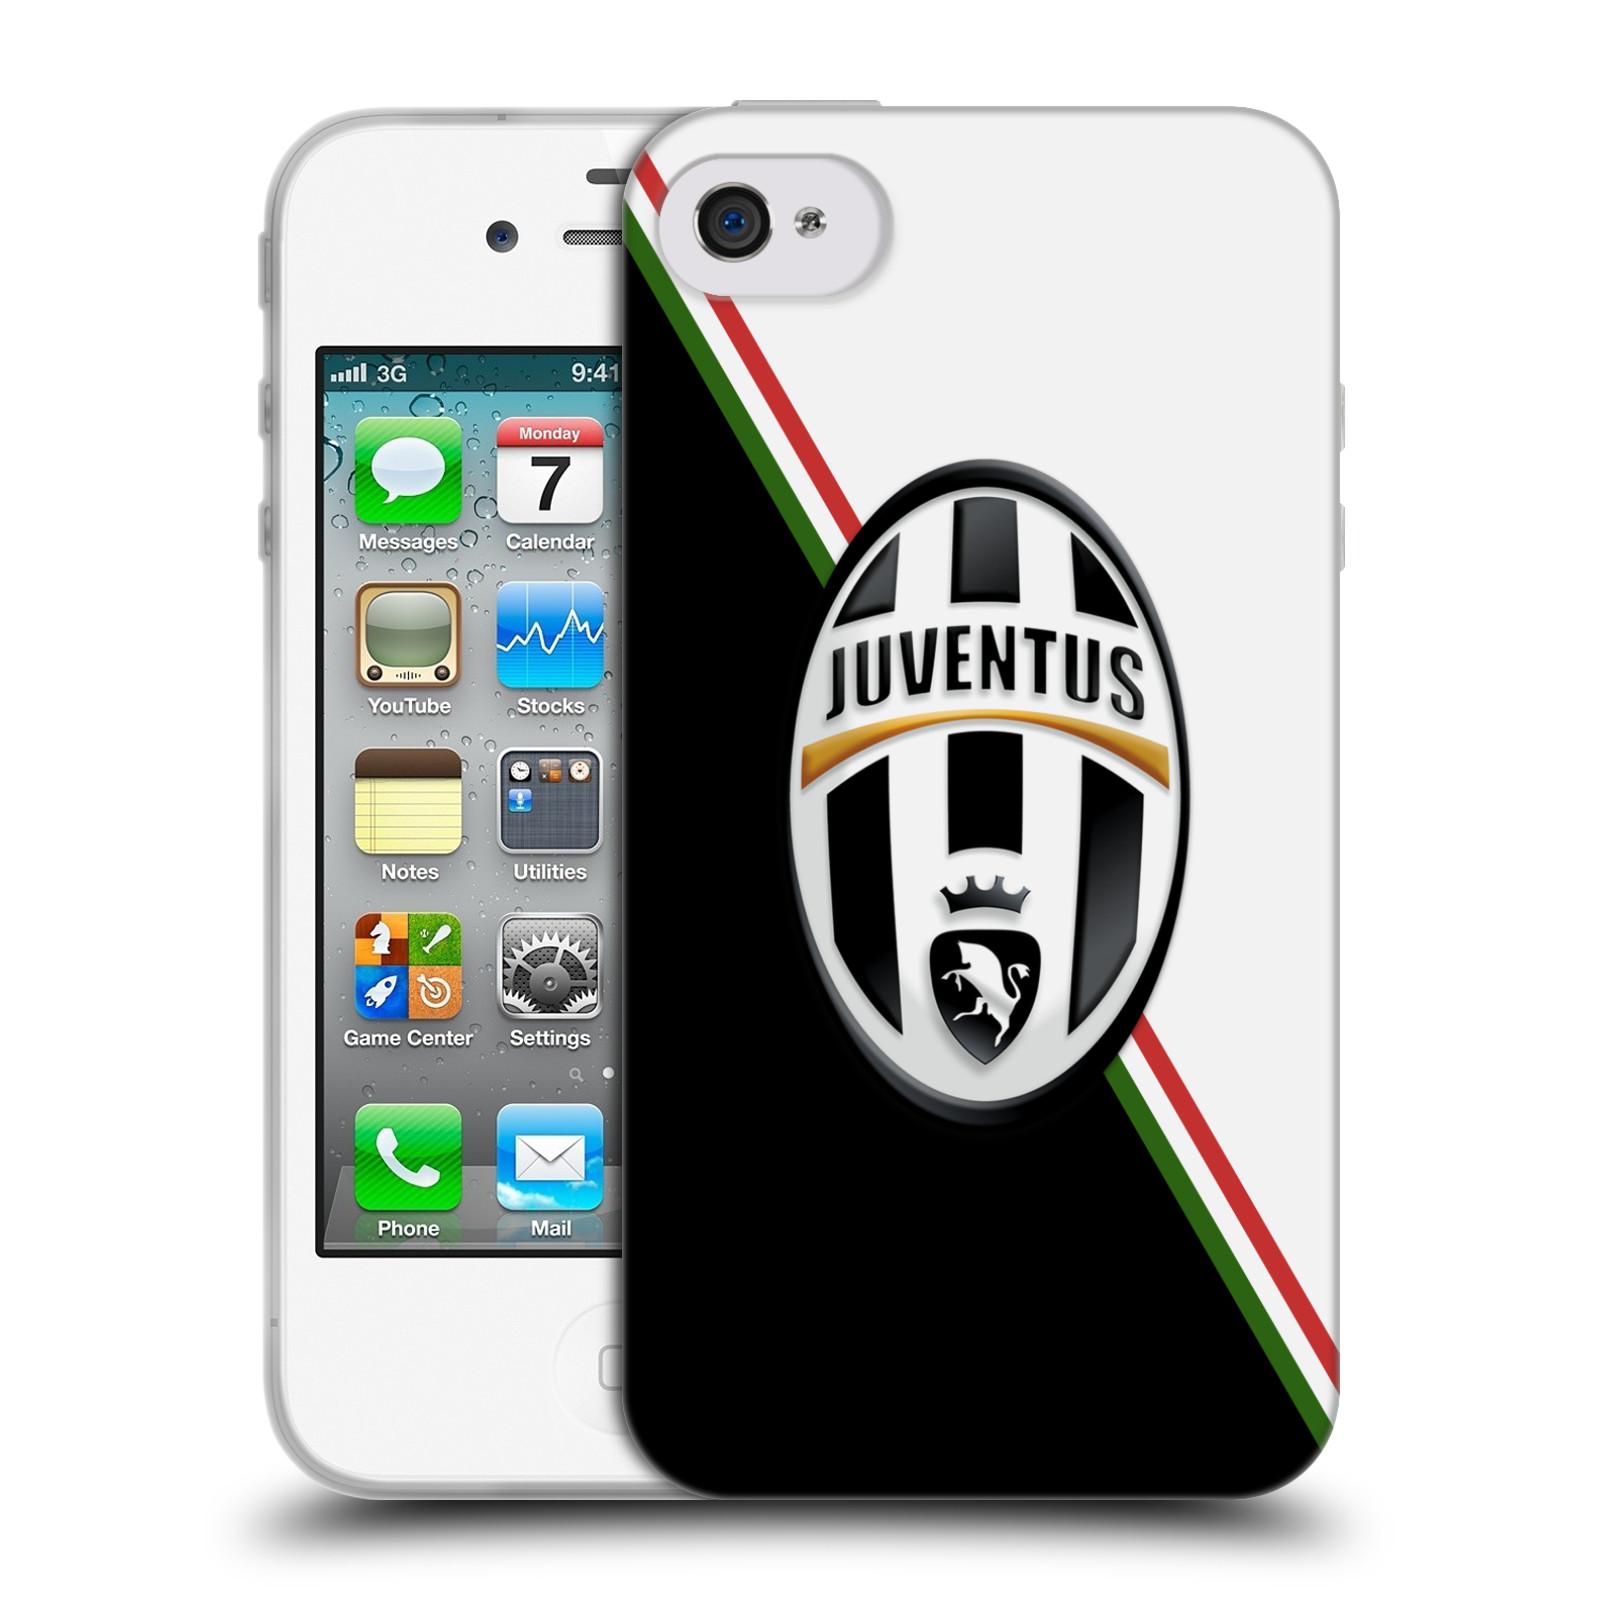 Silikonové pouzdro na mobil Apple iPhone 4 a 4S HEAD CASE Juventus FC - Black and White (Silikonový kryt či obal na mobilní telefon Juventus FC Official pro Apple iPhone 4 a 4S)